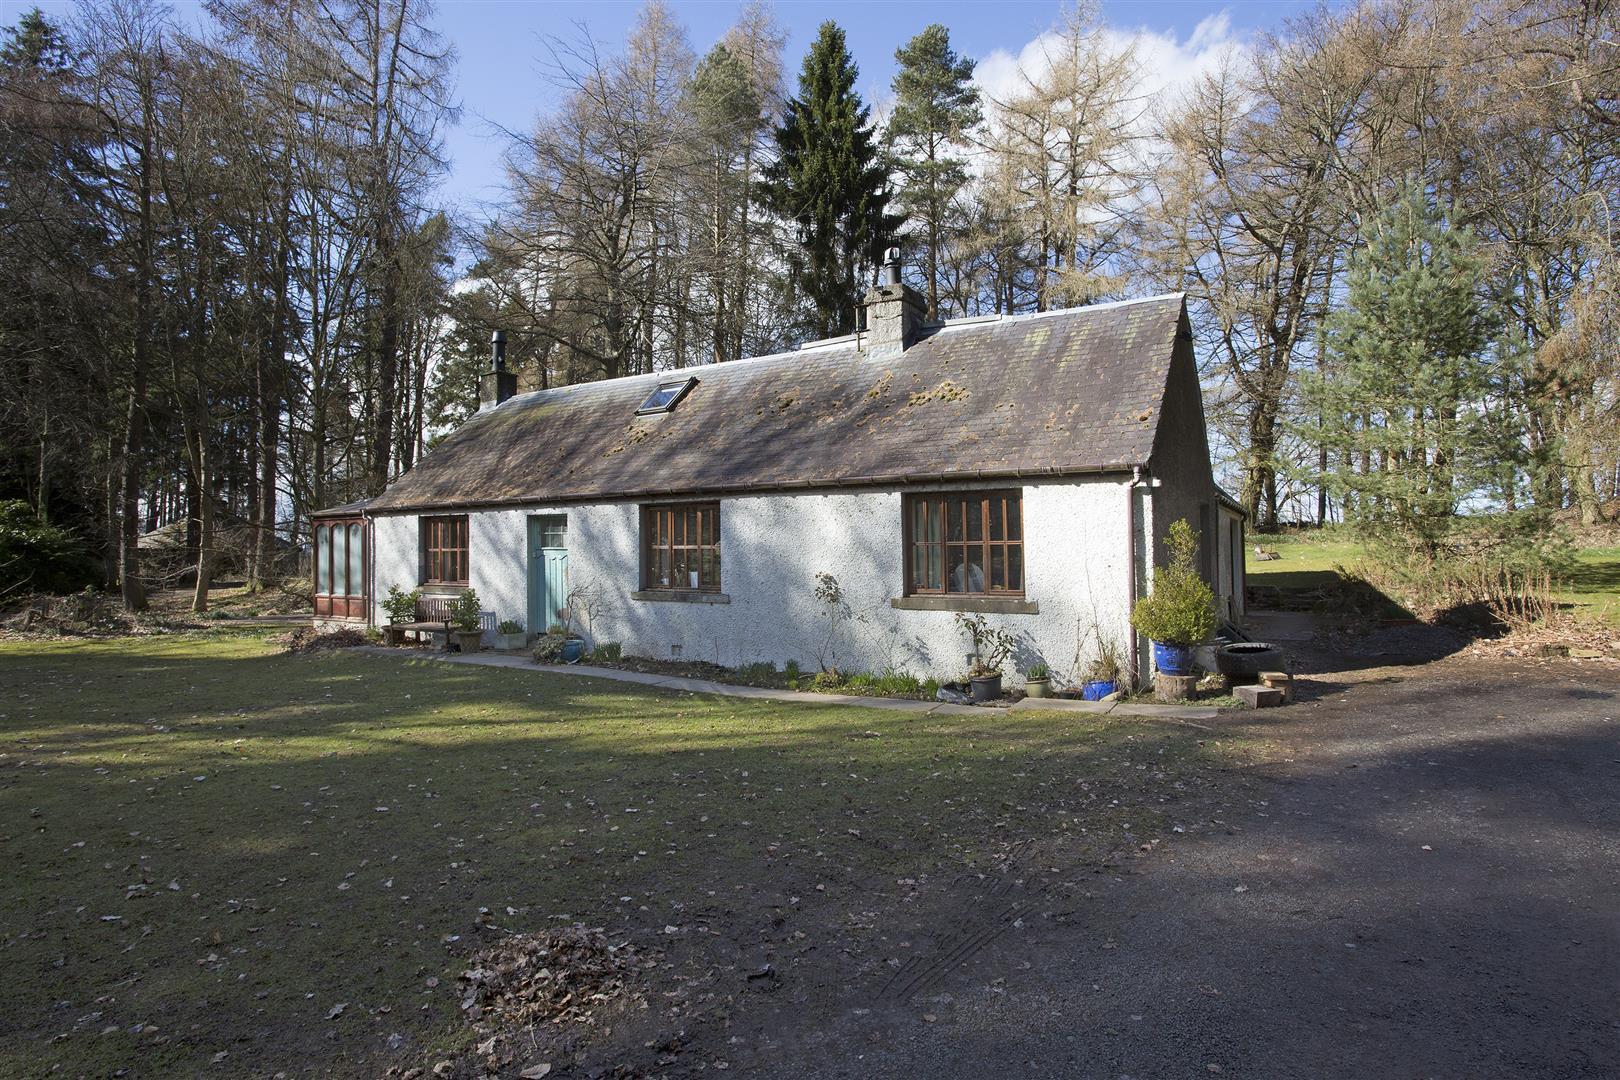 The Hobbit, Kinnochtry Wood, Burrelton, Perthshire, PH13 9PL, UK